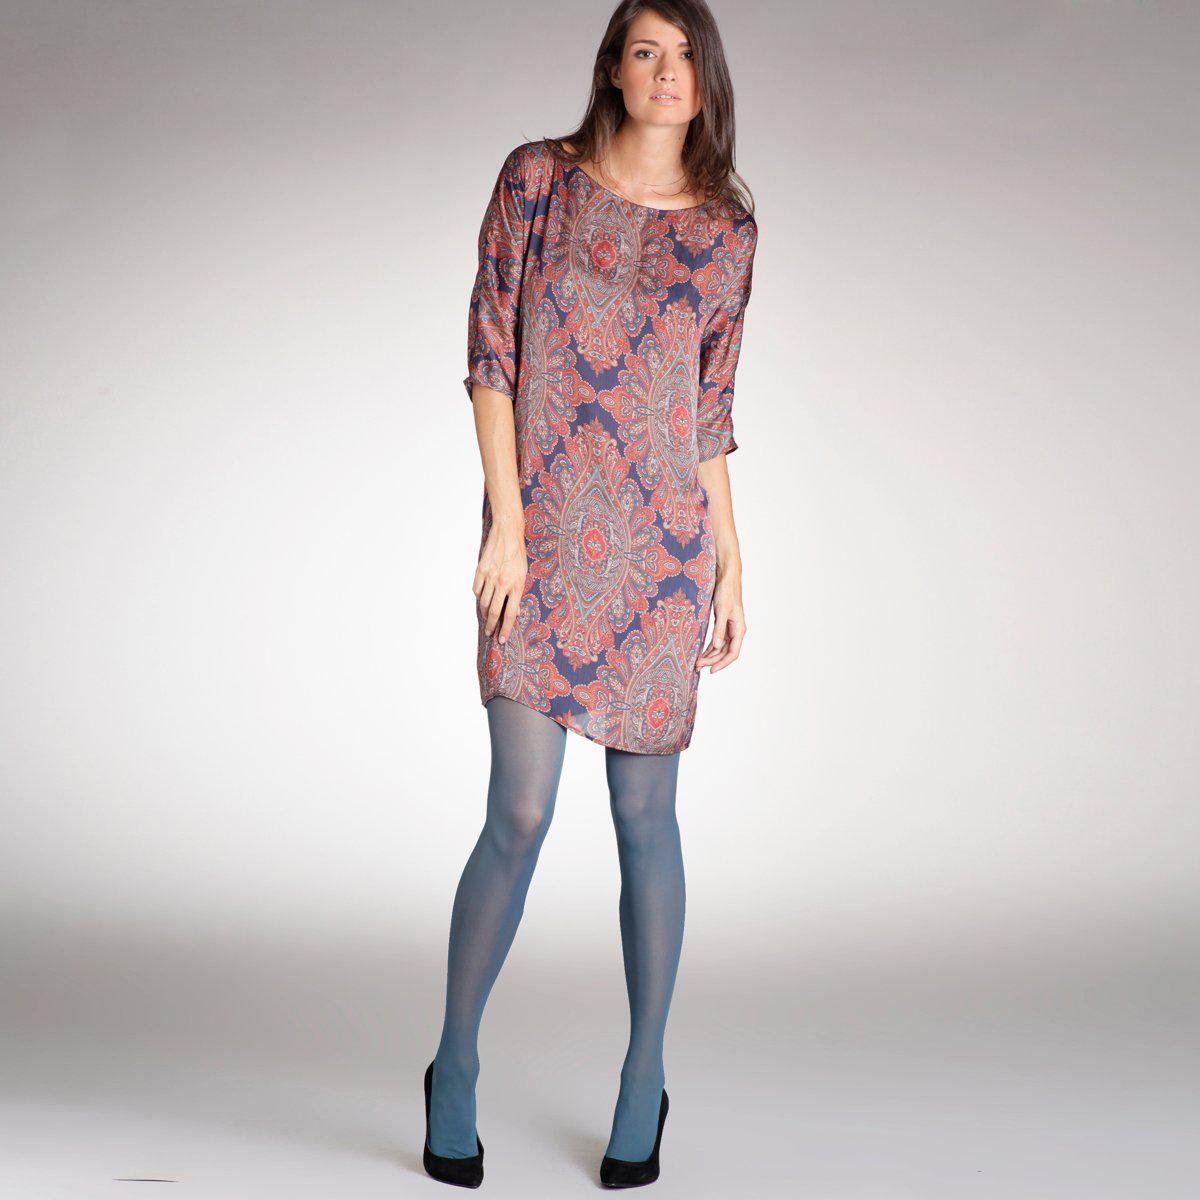 653e5a091a23 Βραδυνα Φορεματα LaRedoute Φθινόπωρο 2011 Κωδ. 324268151